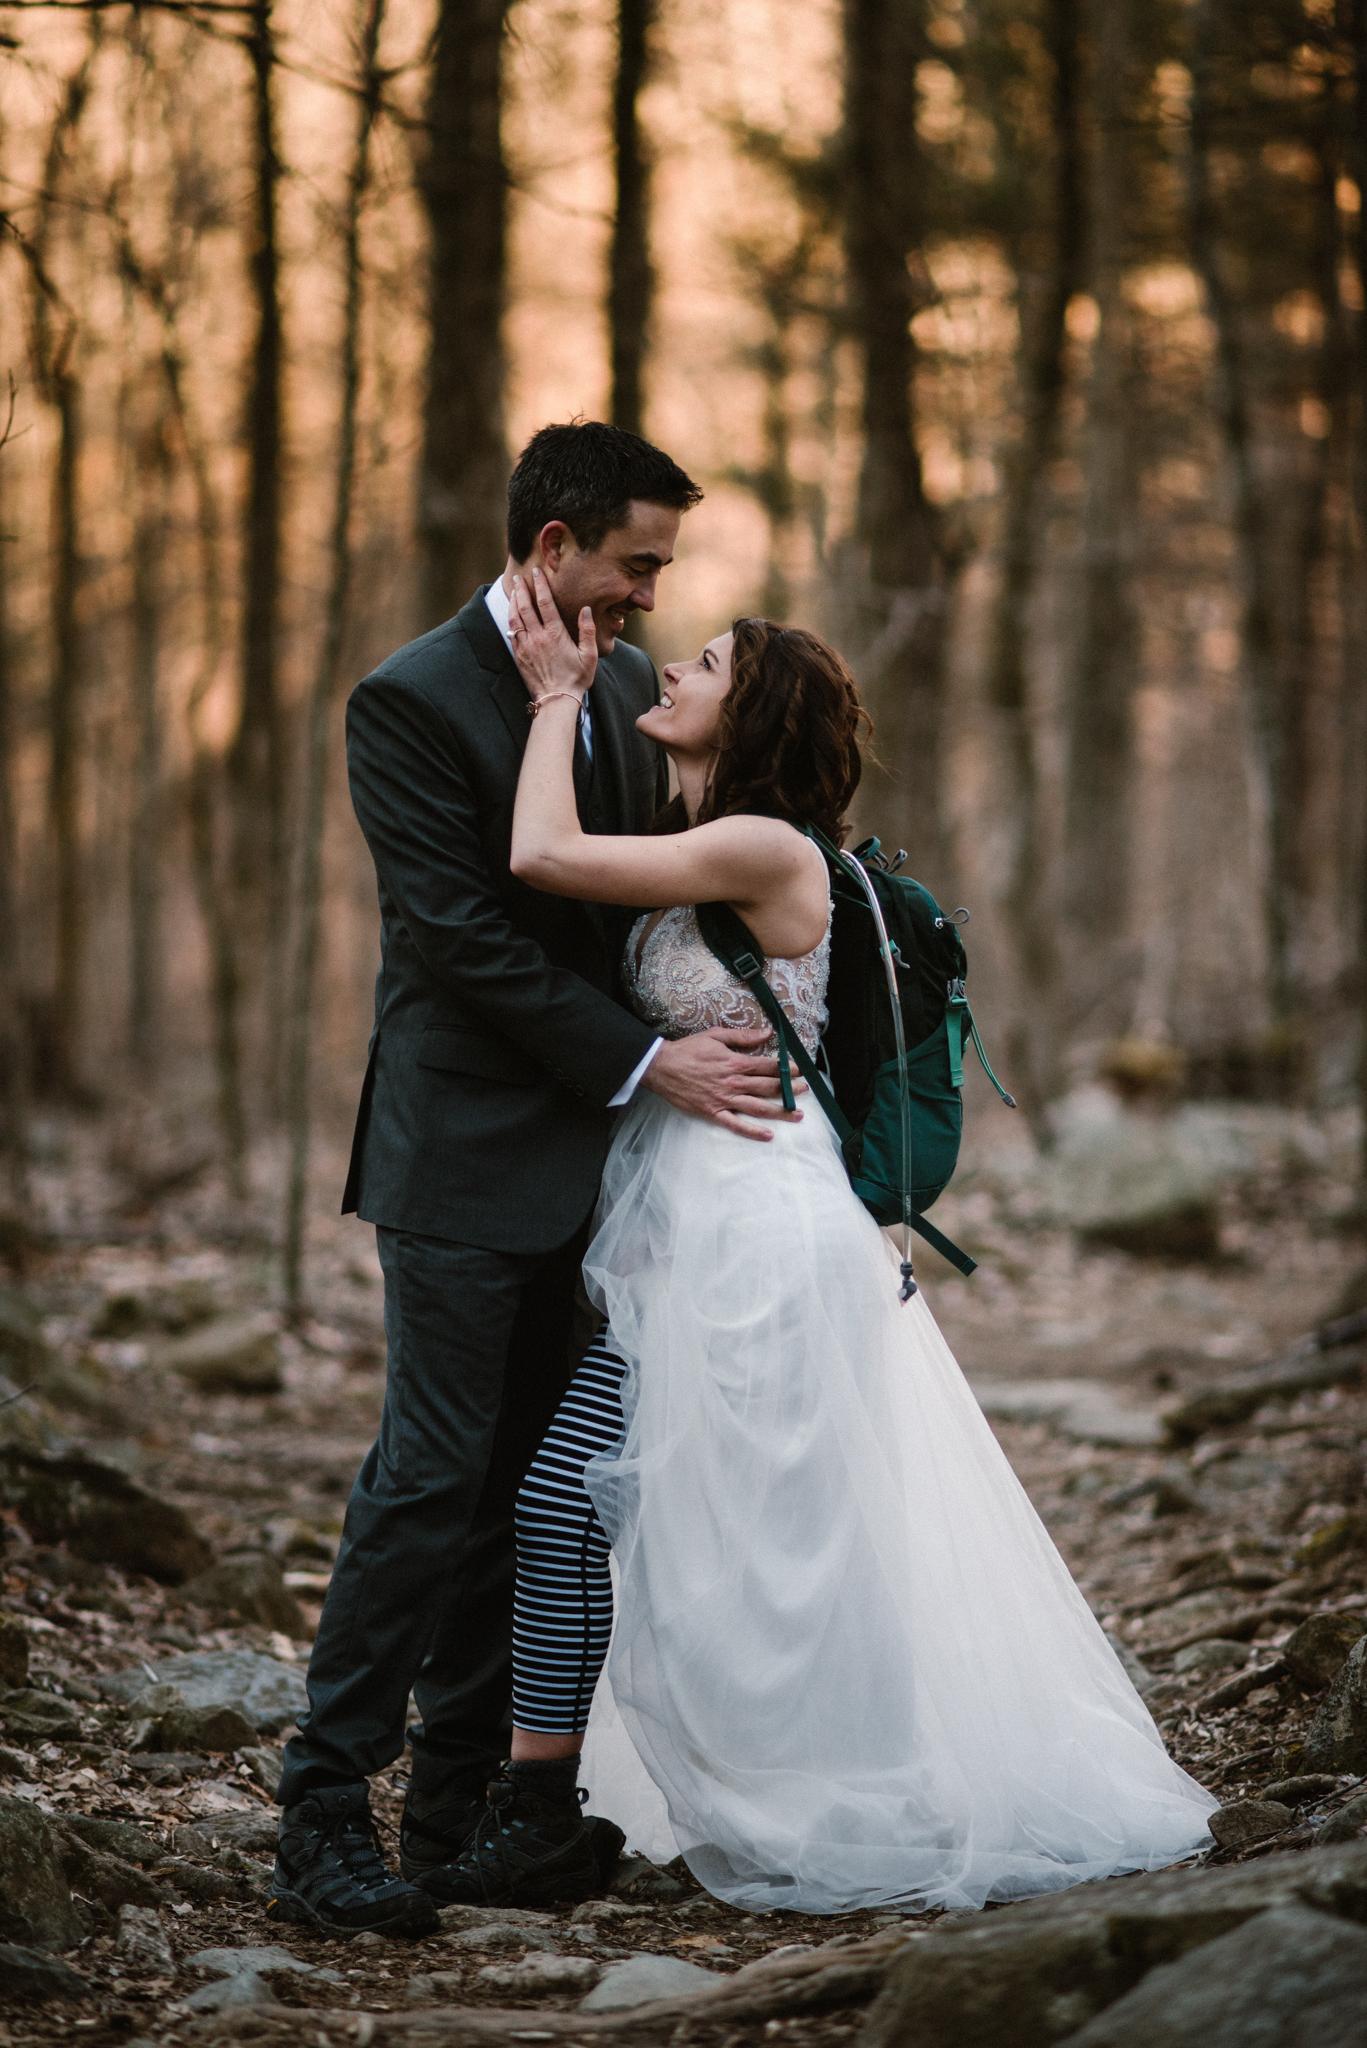 Stephanie and Steve - Shenandoah National Park Elopement - Sunrise Hiking Elopement - Adventurous Elopement - Virginia Elopement Photographer - Shenandoah national Park Wedding Photographer - White Sails Creative_42.jpg